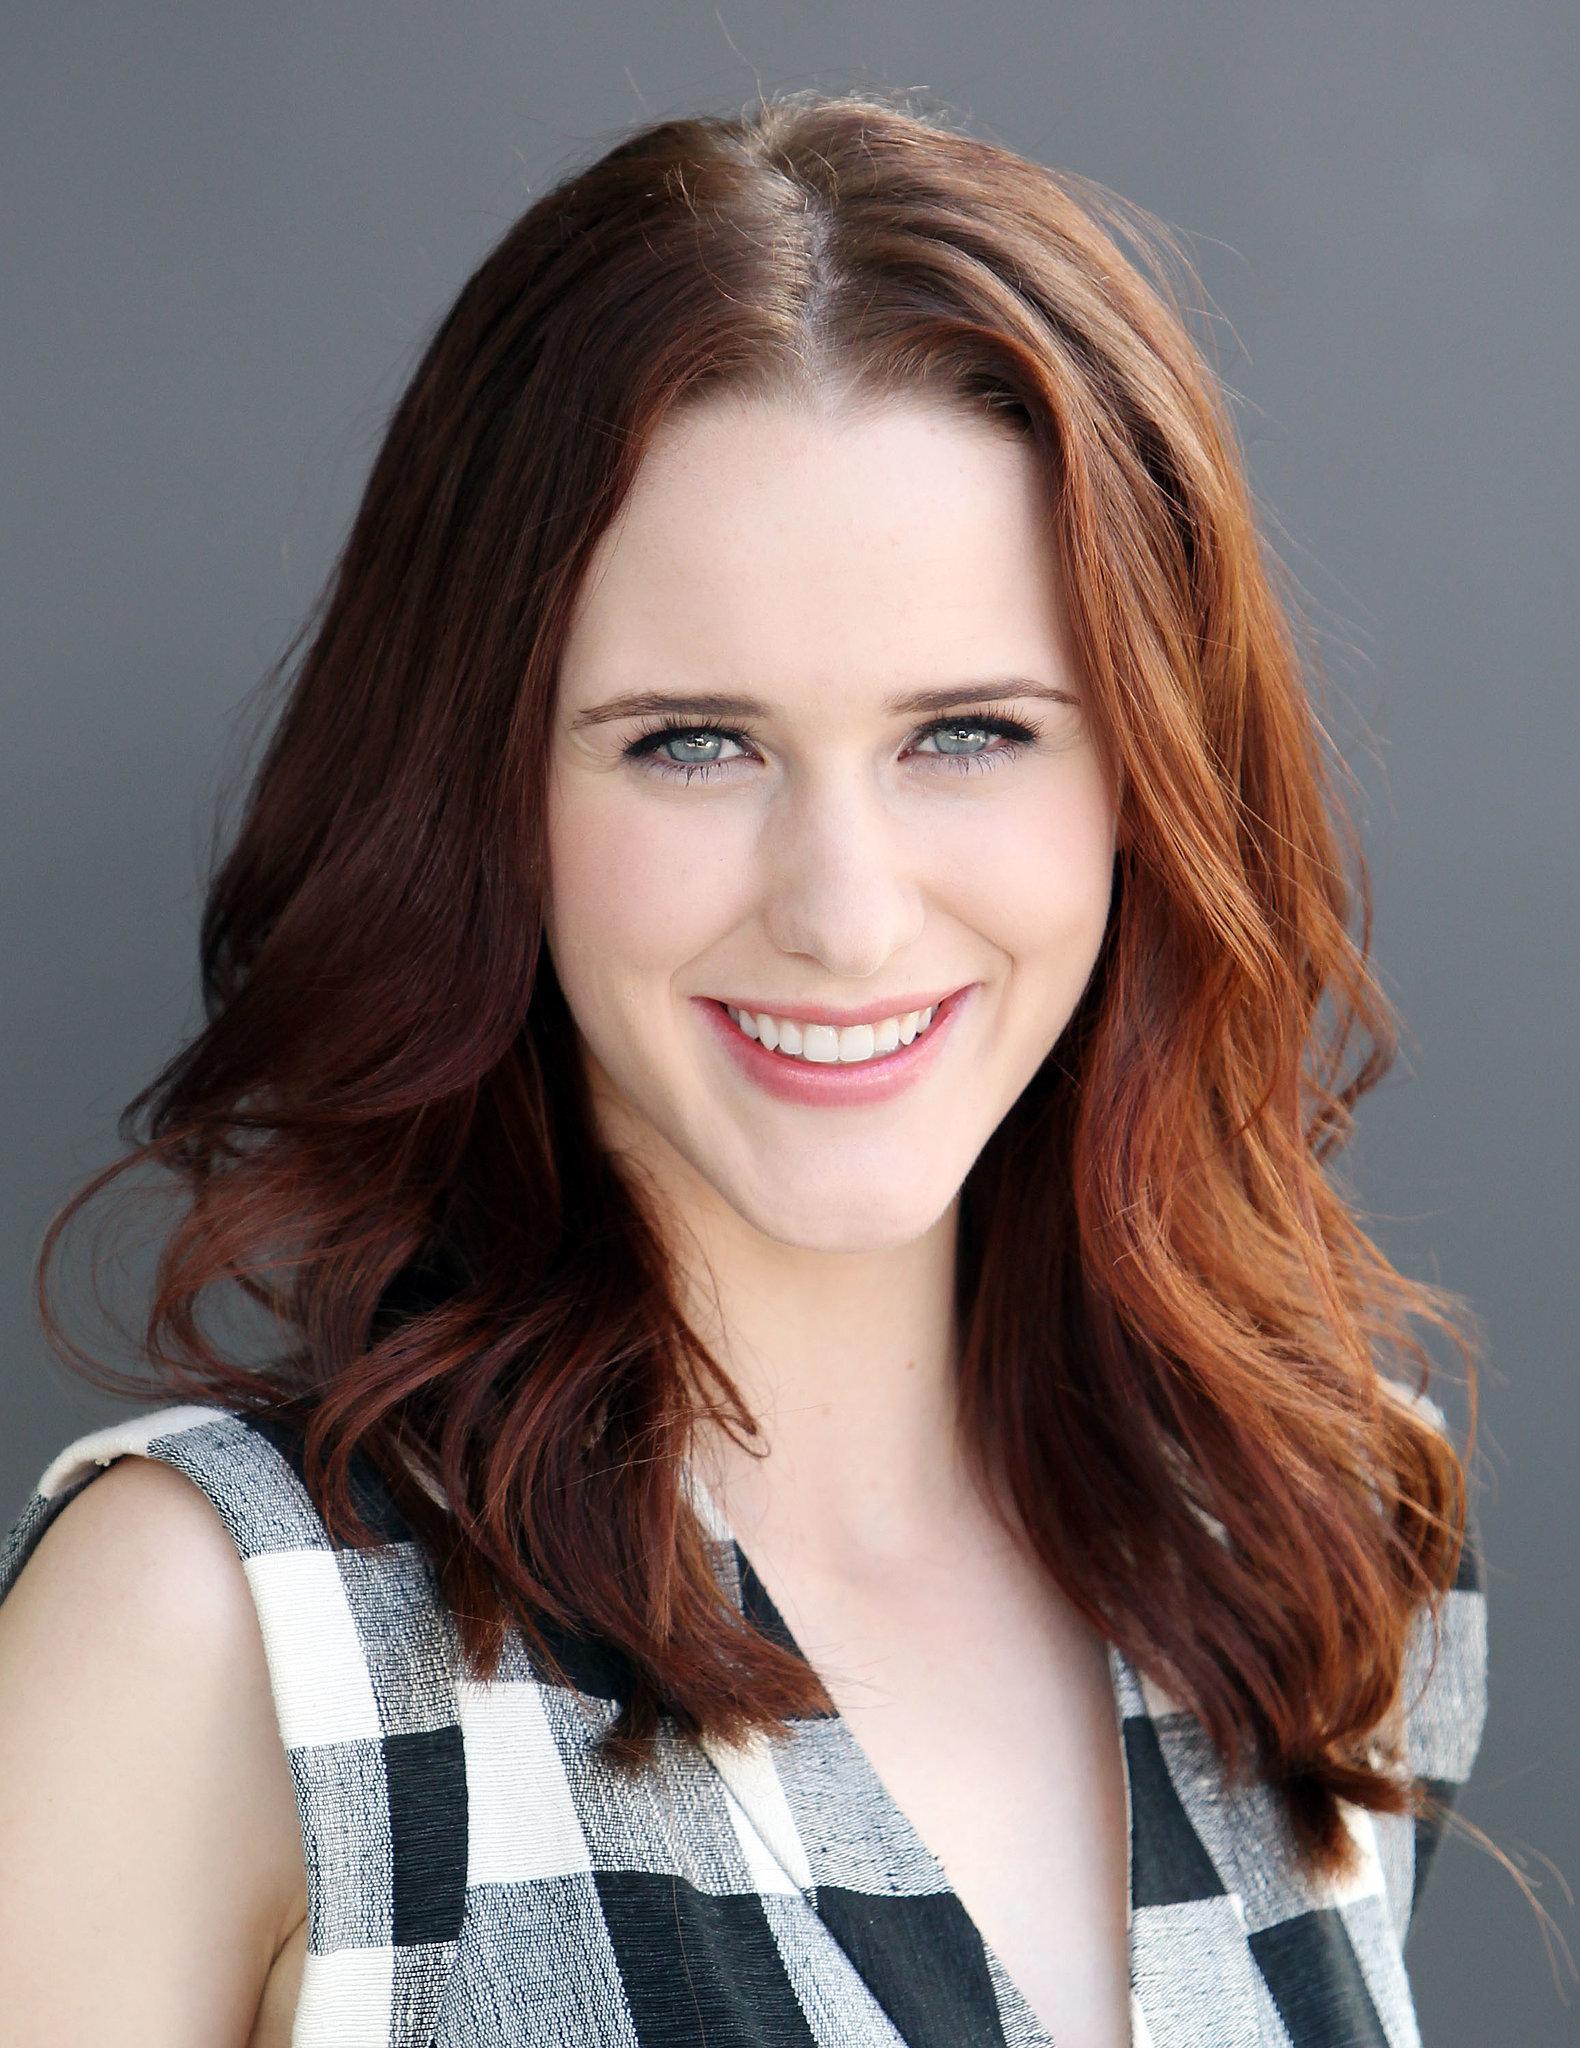 Rachel Brosnahan Films Xperehod Com